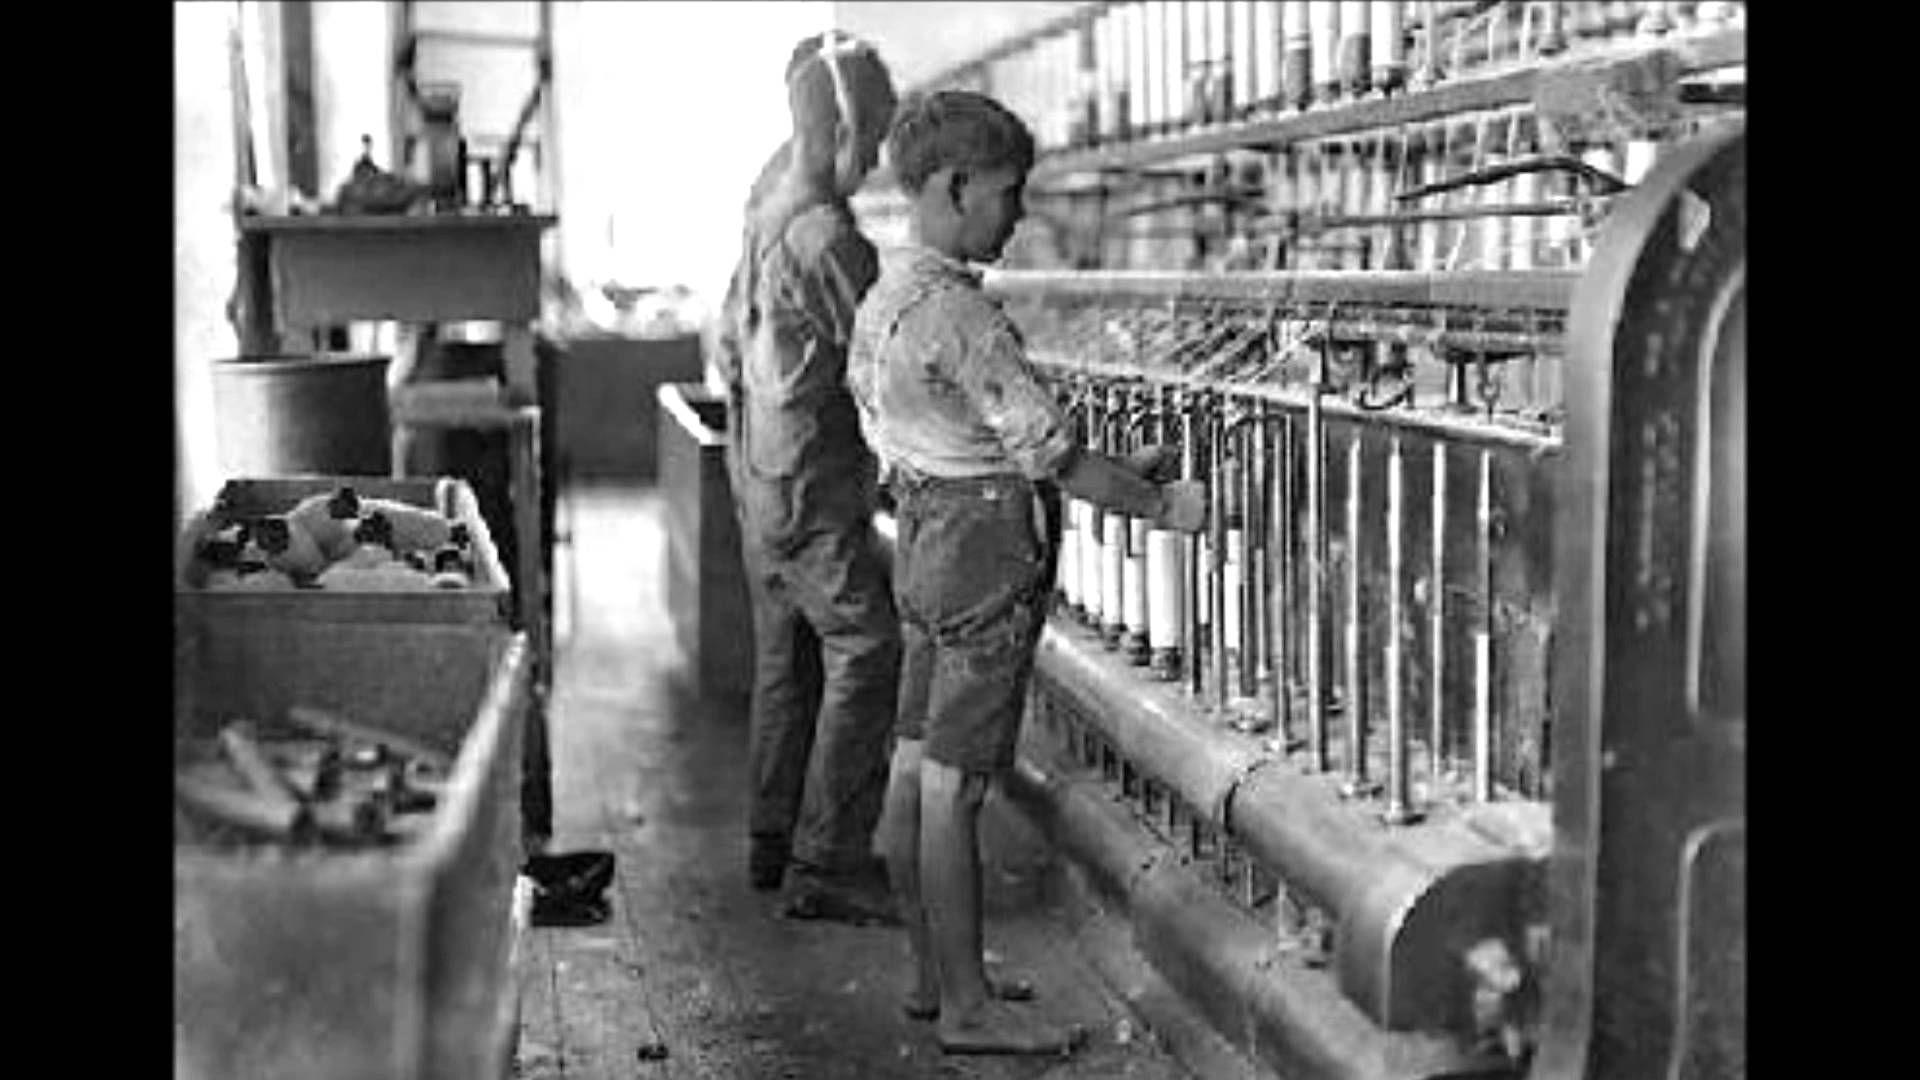 Child Labor In The Industrial Revolution